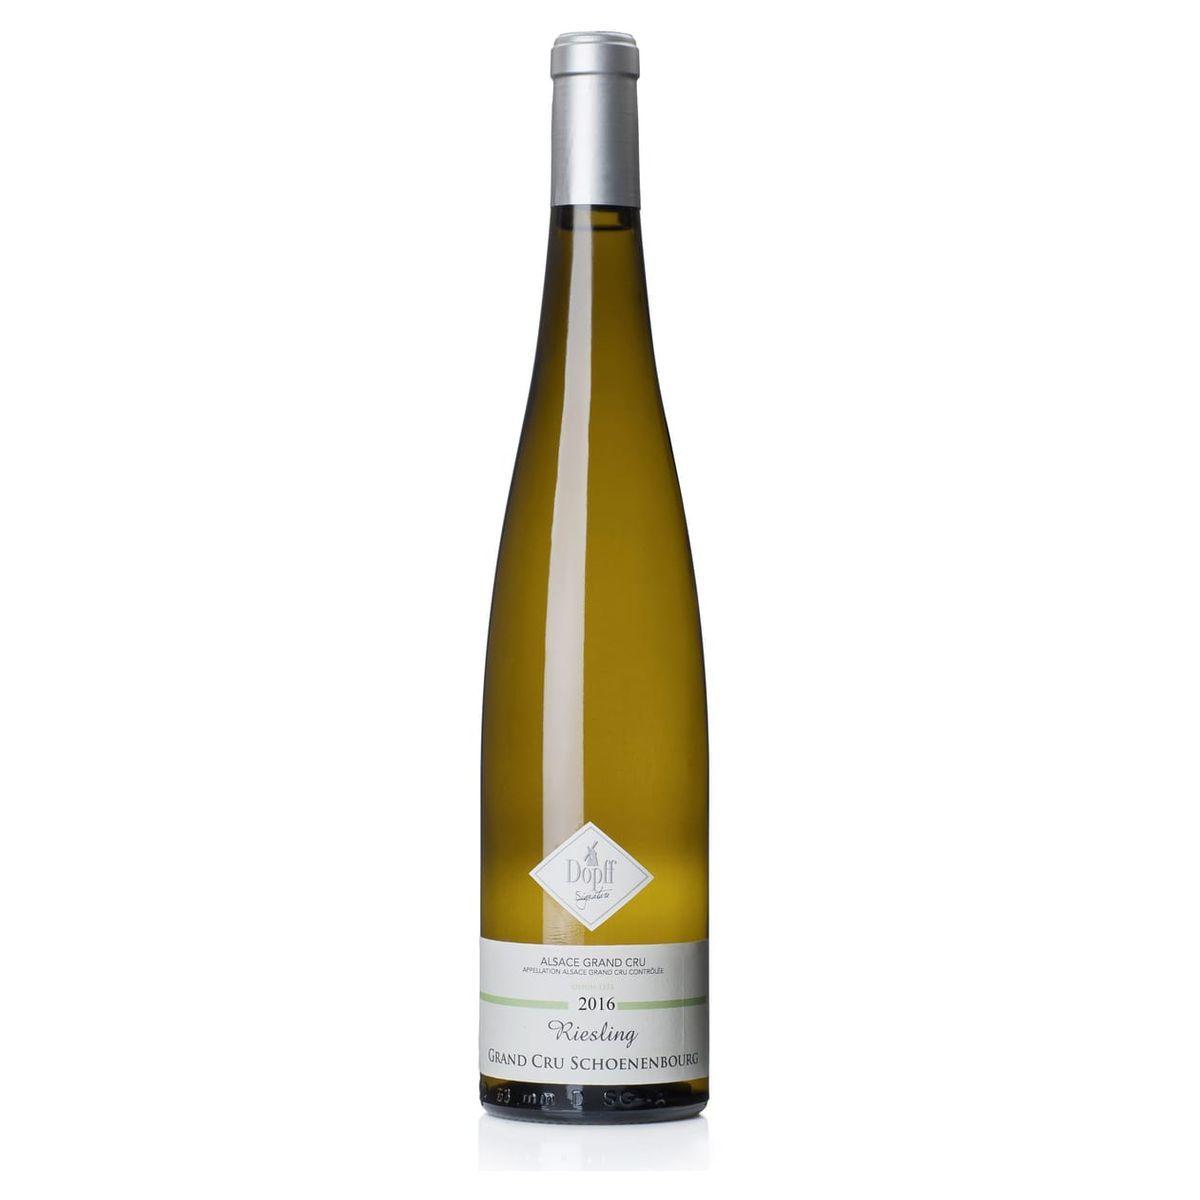 AOP Alsace Riesling Grand Cru Domaine Dopff Schoenenbourg blanc 2016